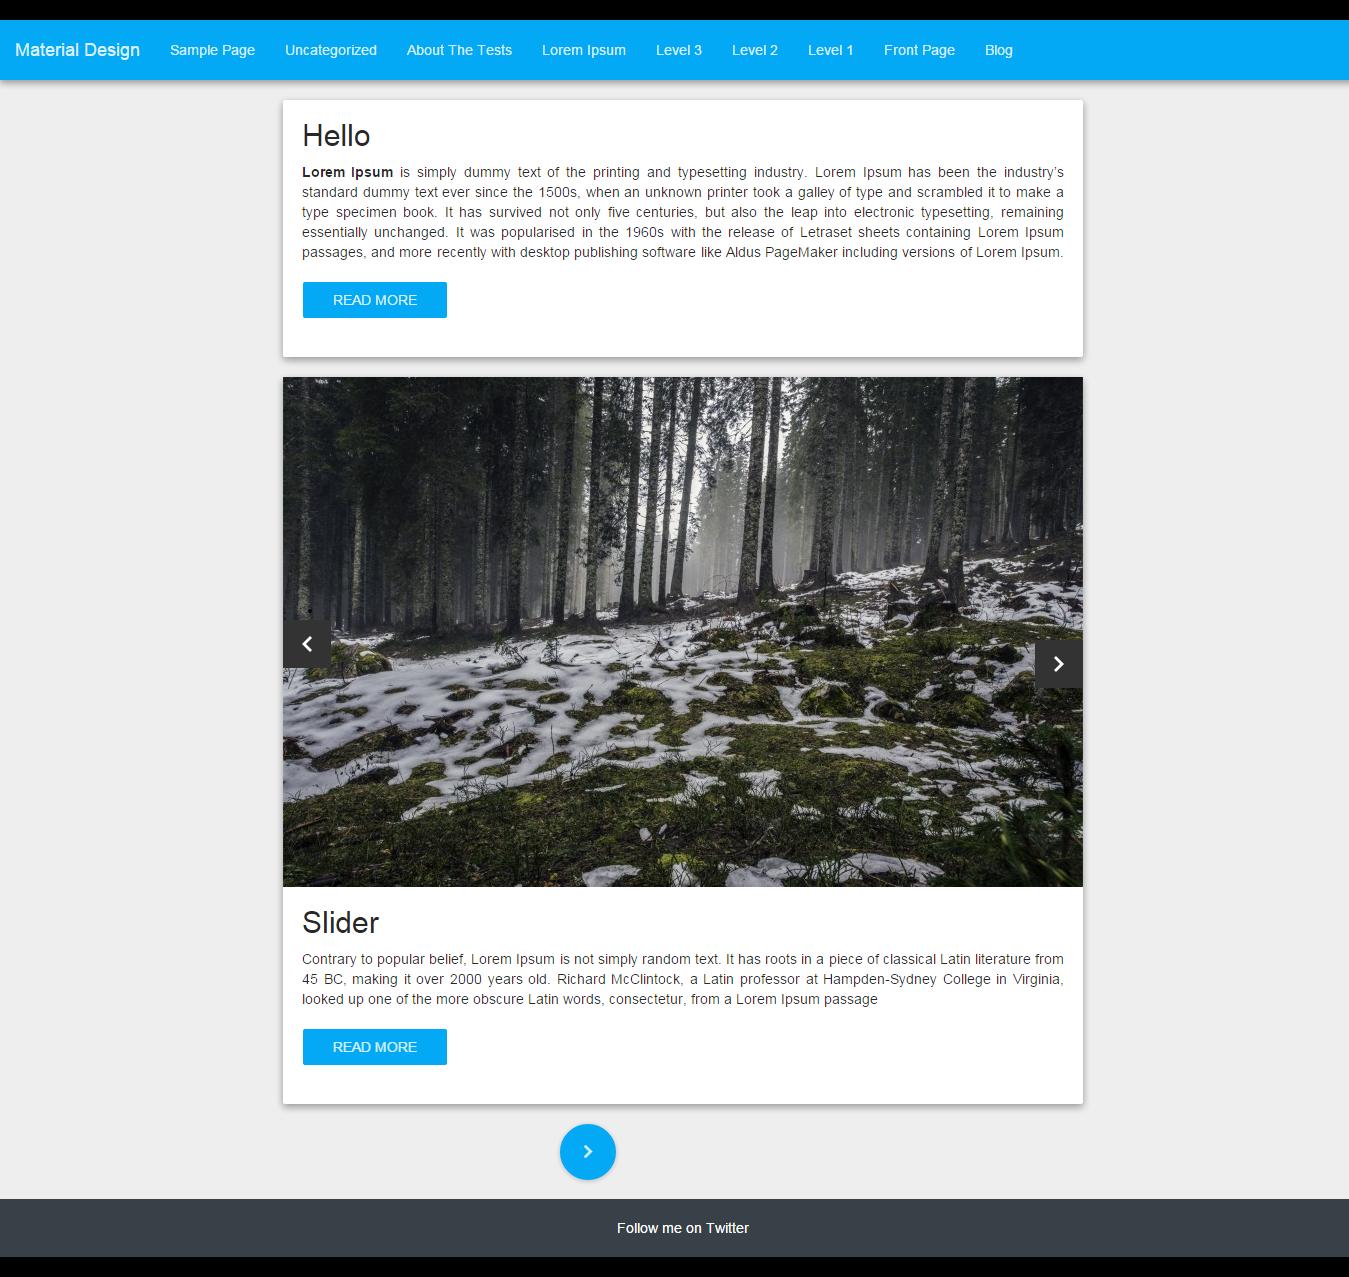 Wordpress theme based on material design | 11 Free Material Design ...